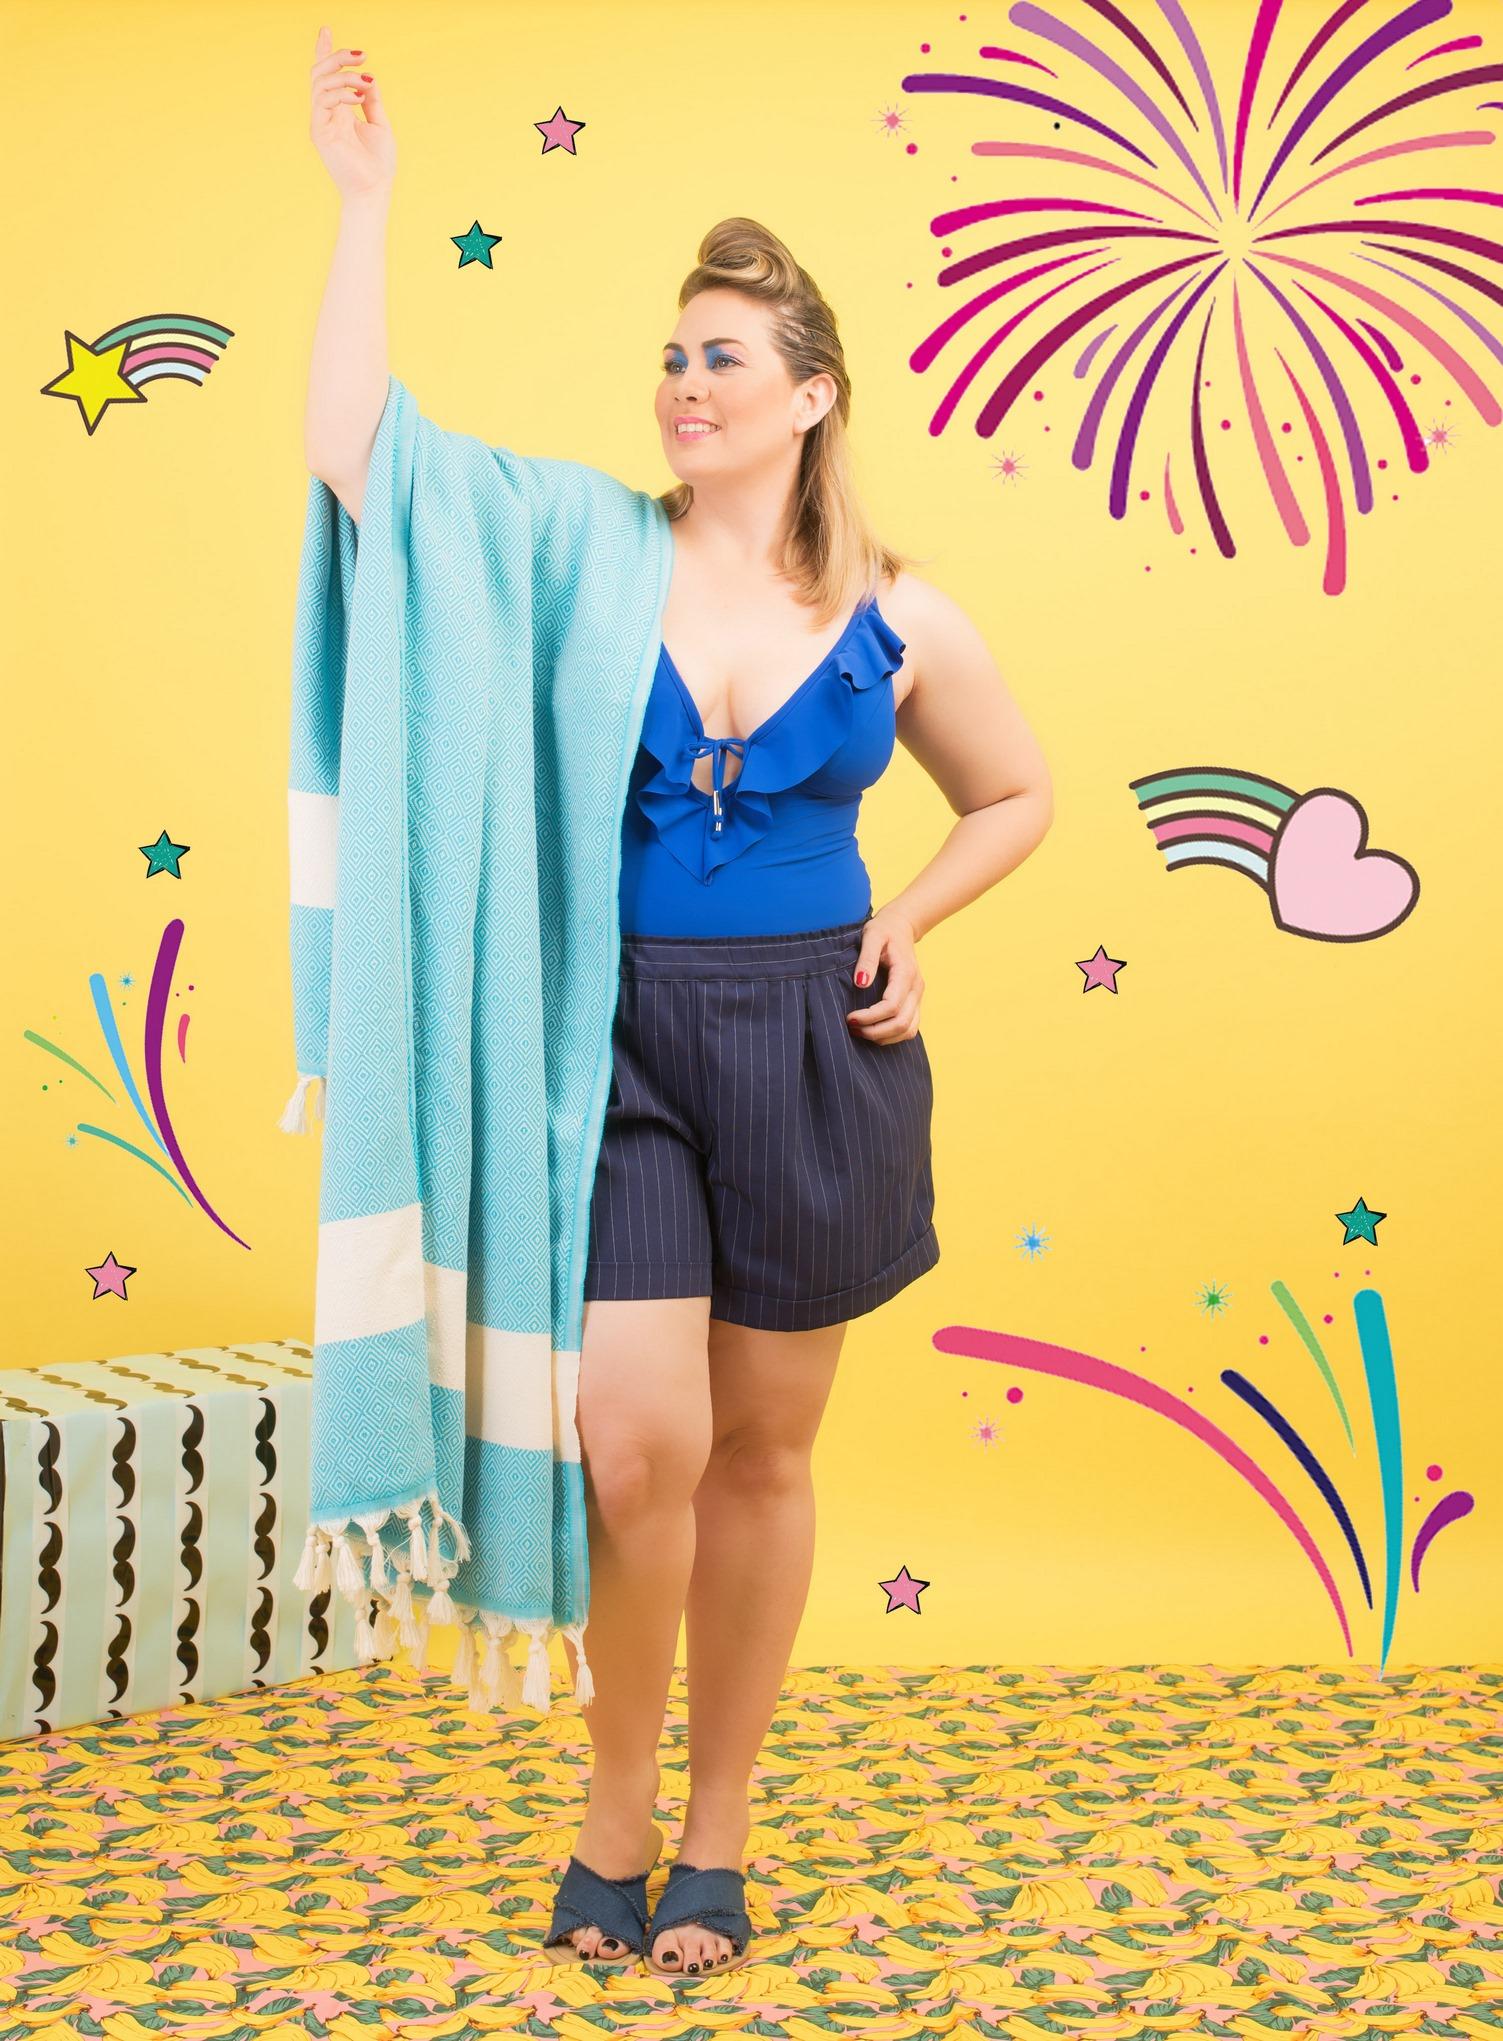 PLUS SIZE FASHION WEEK מכנסיים AYE, בגד ים קוברה לאליס, מגבת במידות גדולות CHIC AND COMFY, צילום פזית עוז (Copy).jpg